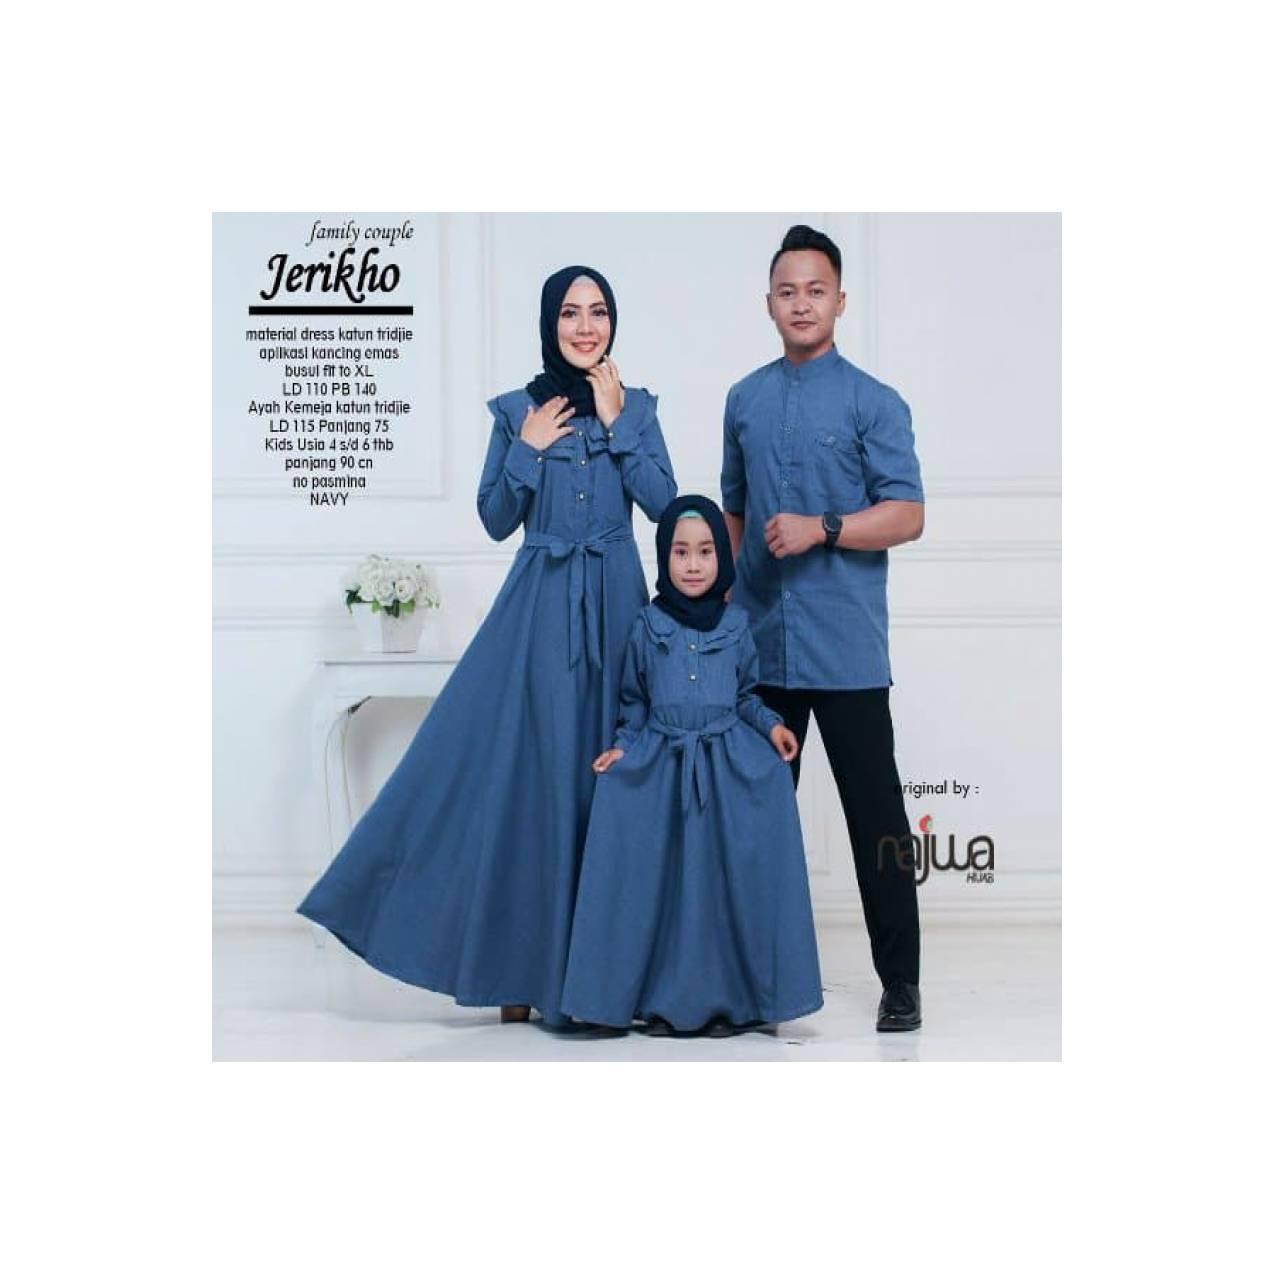 TERLARIS Baju gamis dan kemeja ibu anak ayah jerikho couple family ori